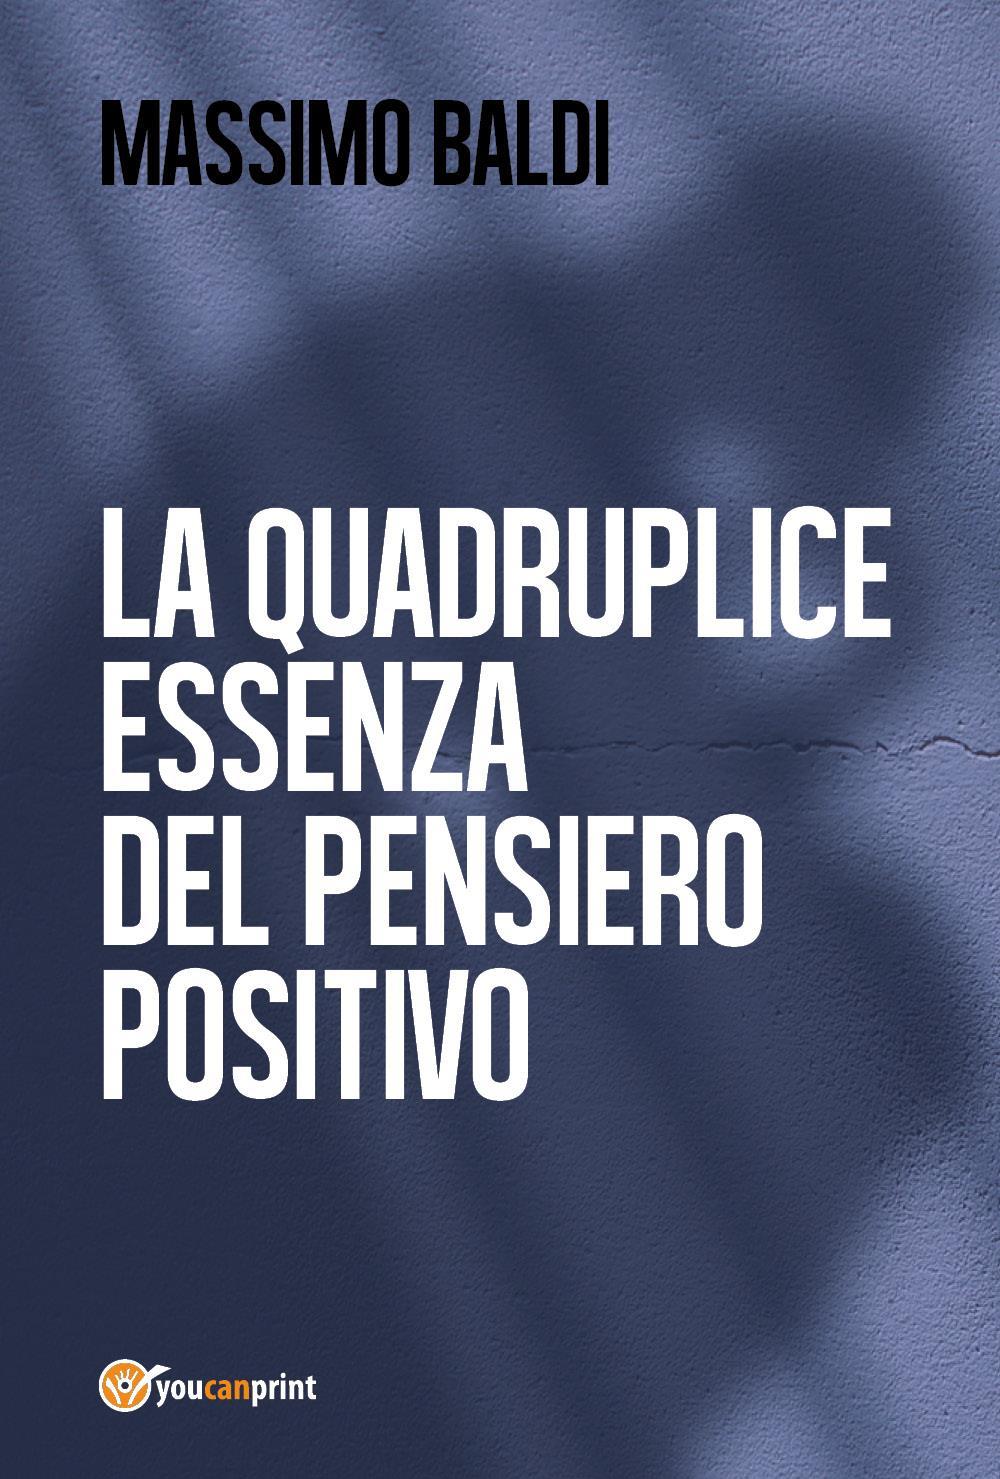 La quadruplice essenza del pensiero positivo